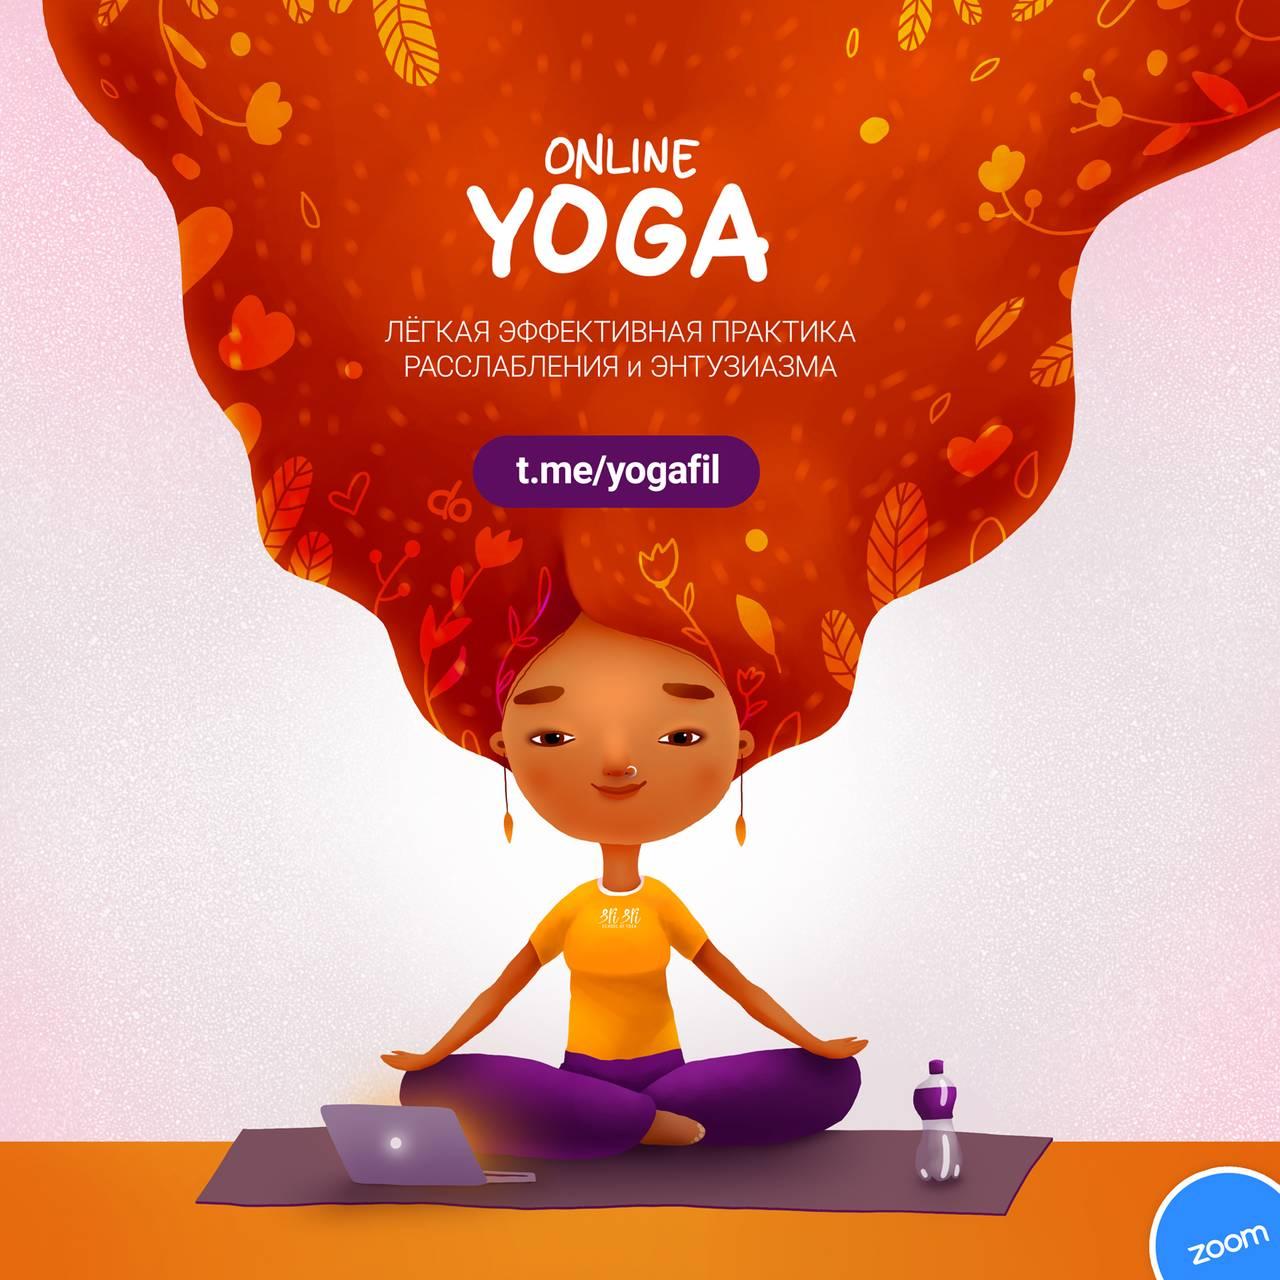 yoga_online_woman.jpg